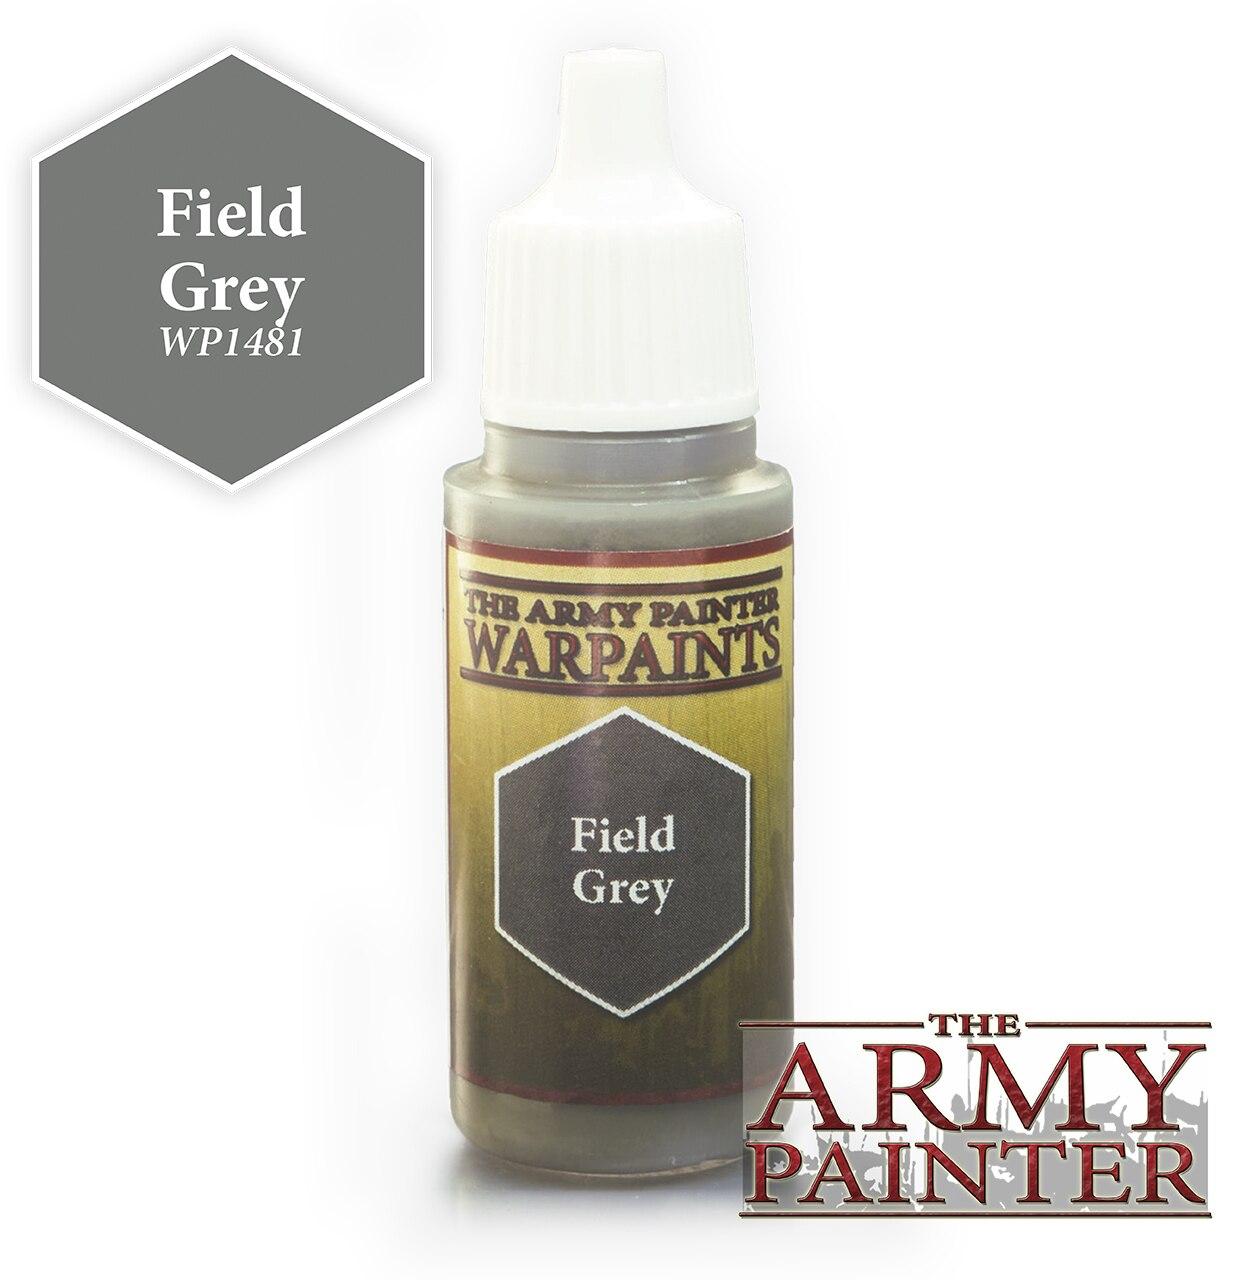 Army Painter Warpaint - Field Grey